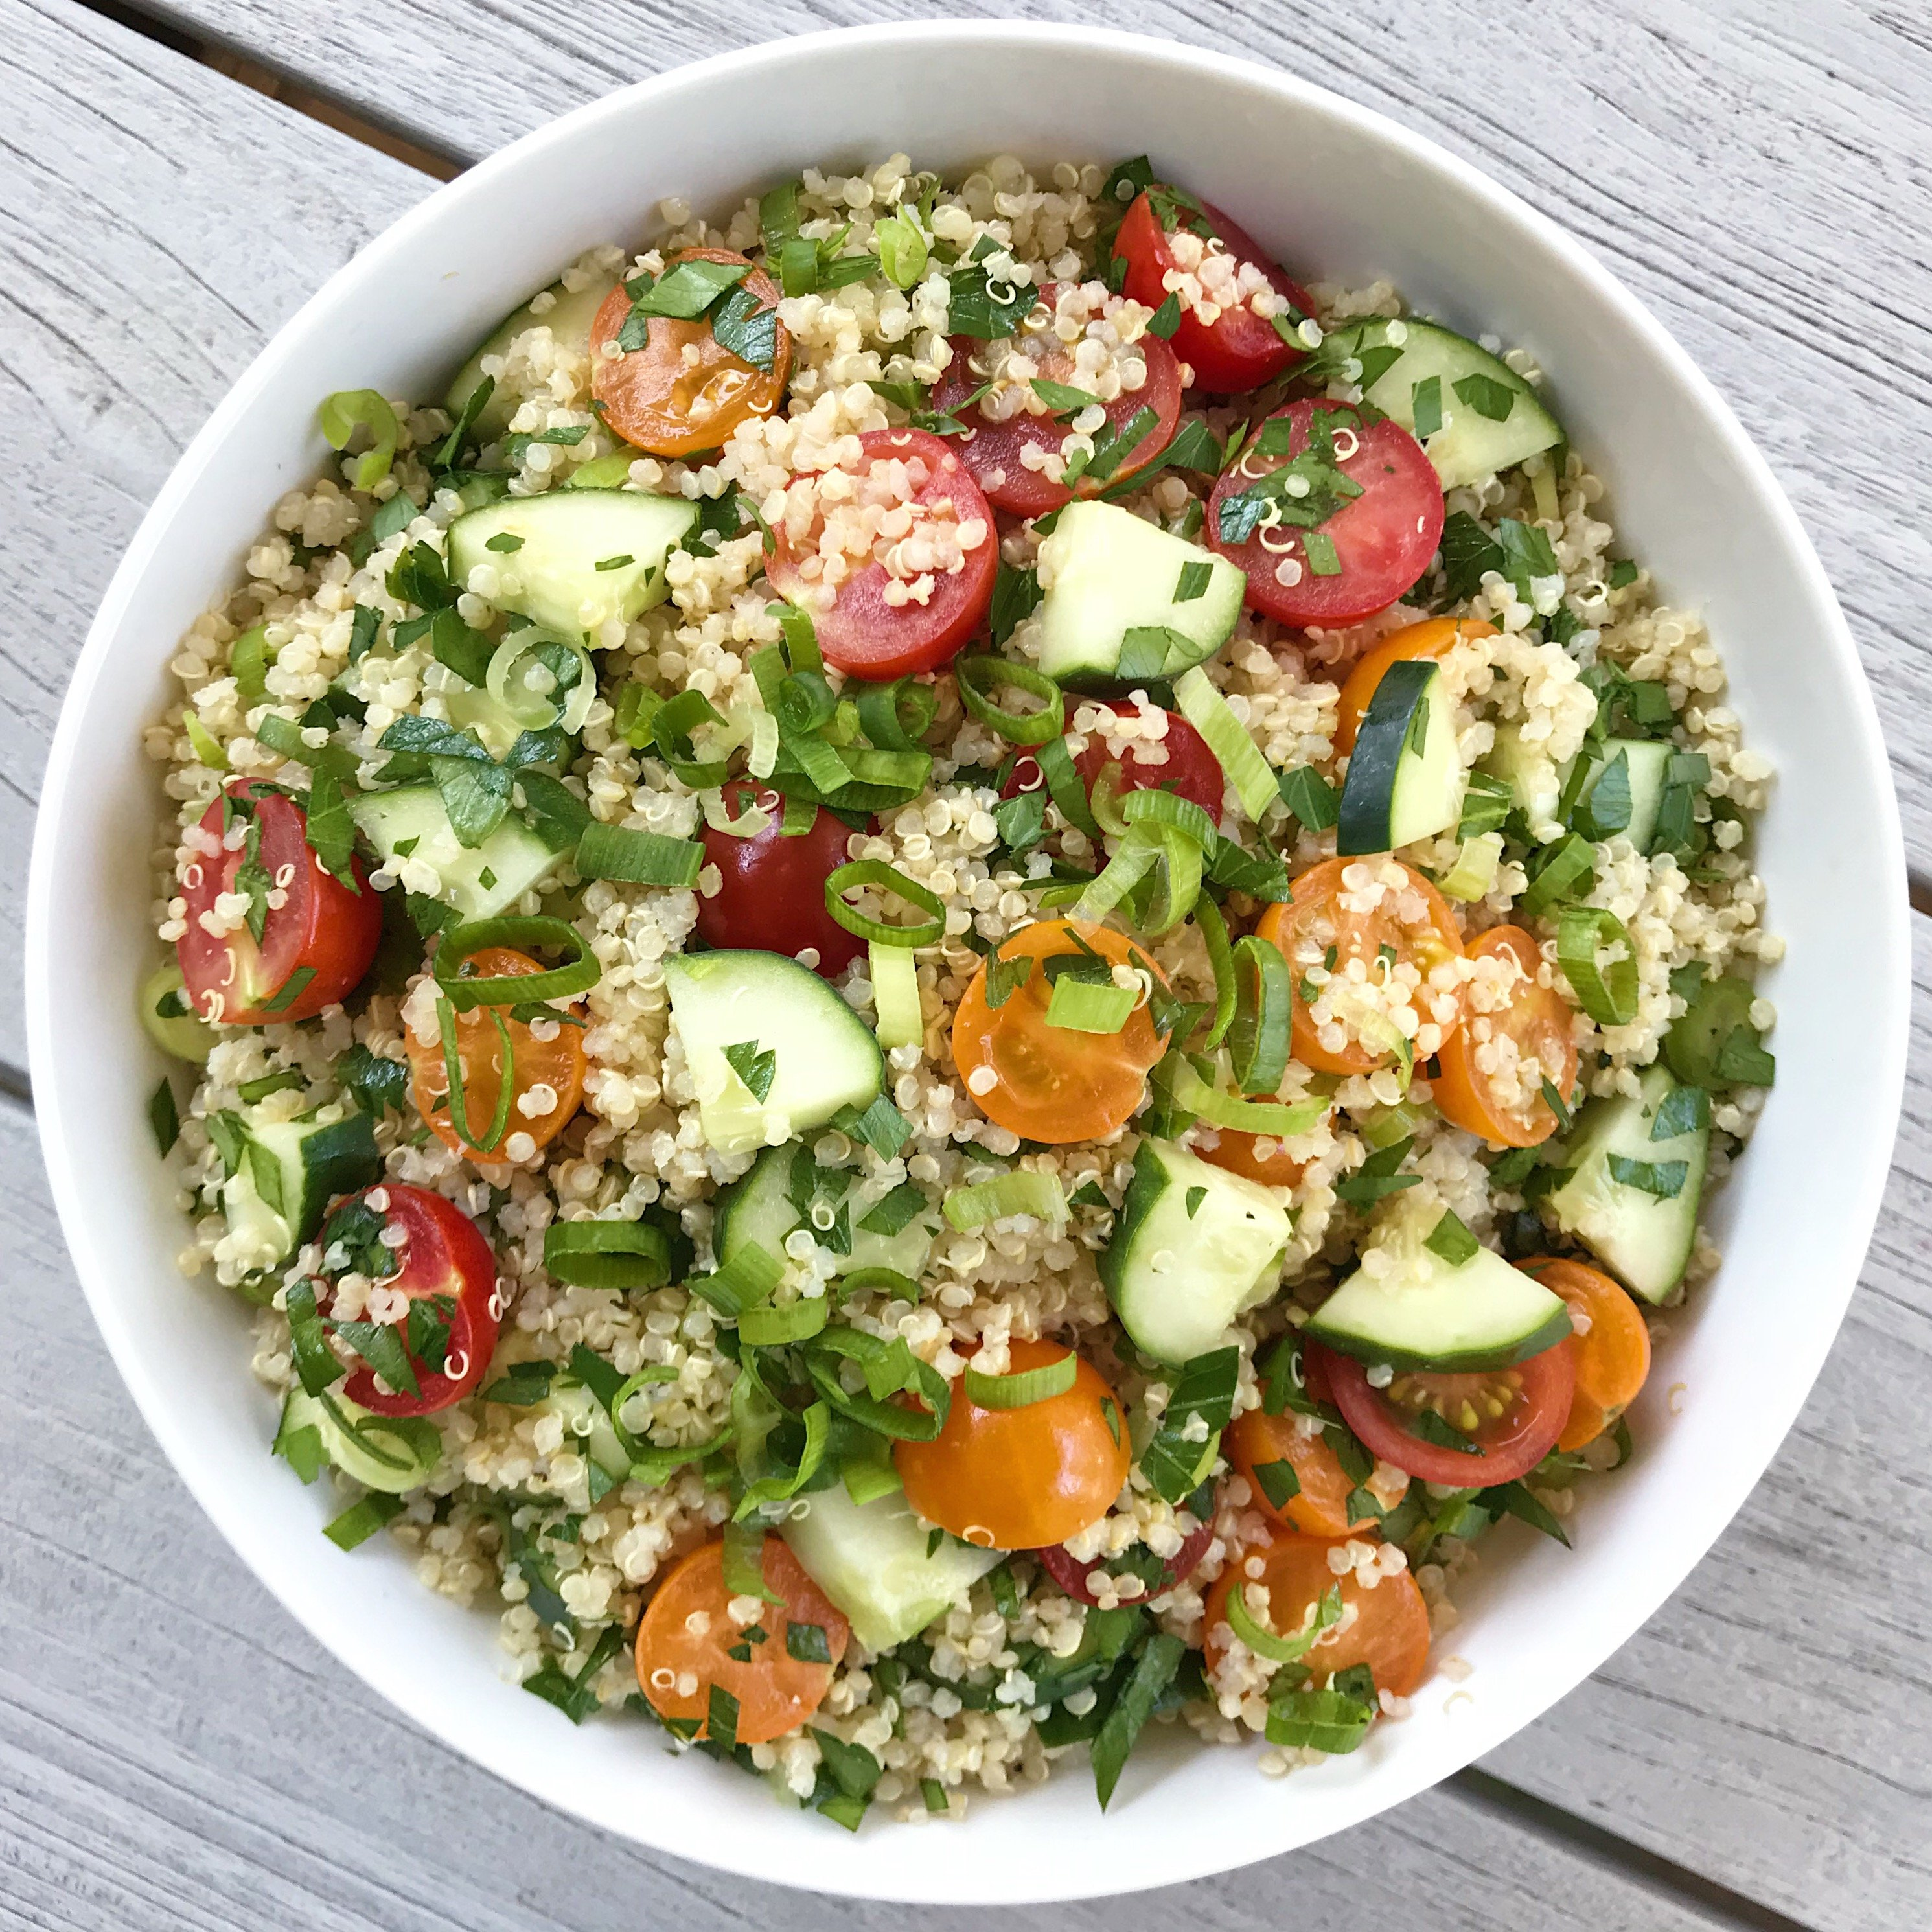 Quinoa Tabbouleh Healthygffamily Com,Pork Loin Country Style Ribs Boneless